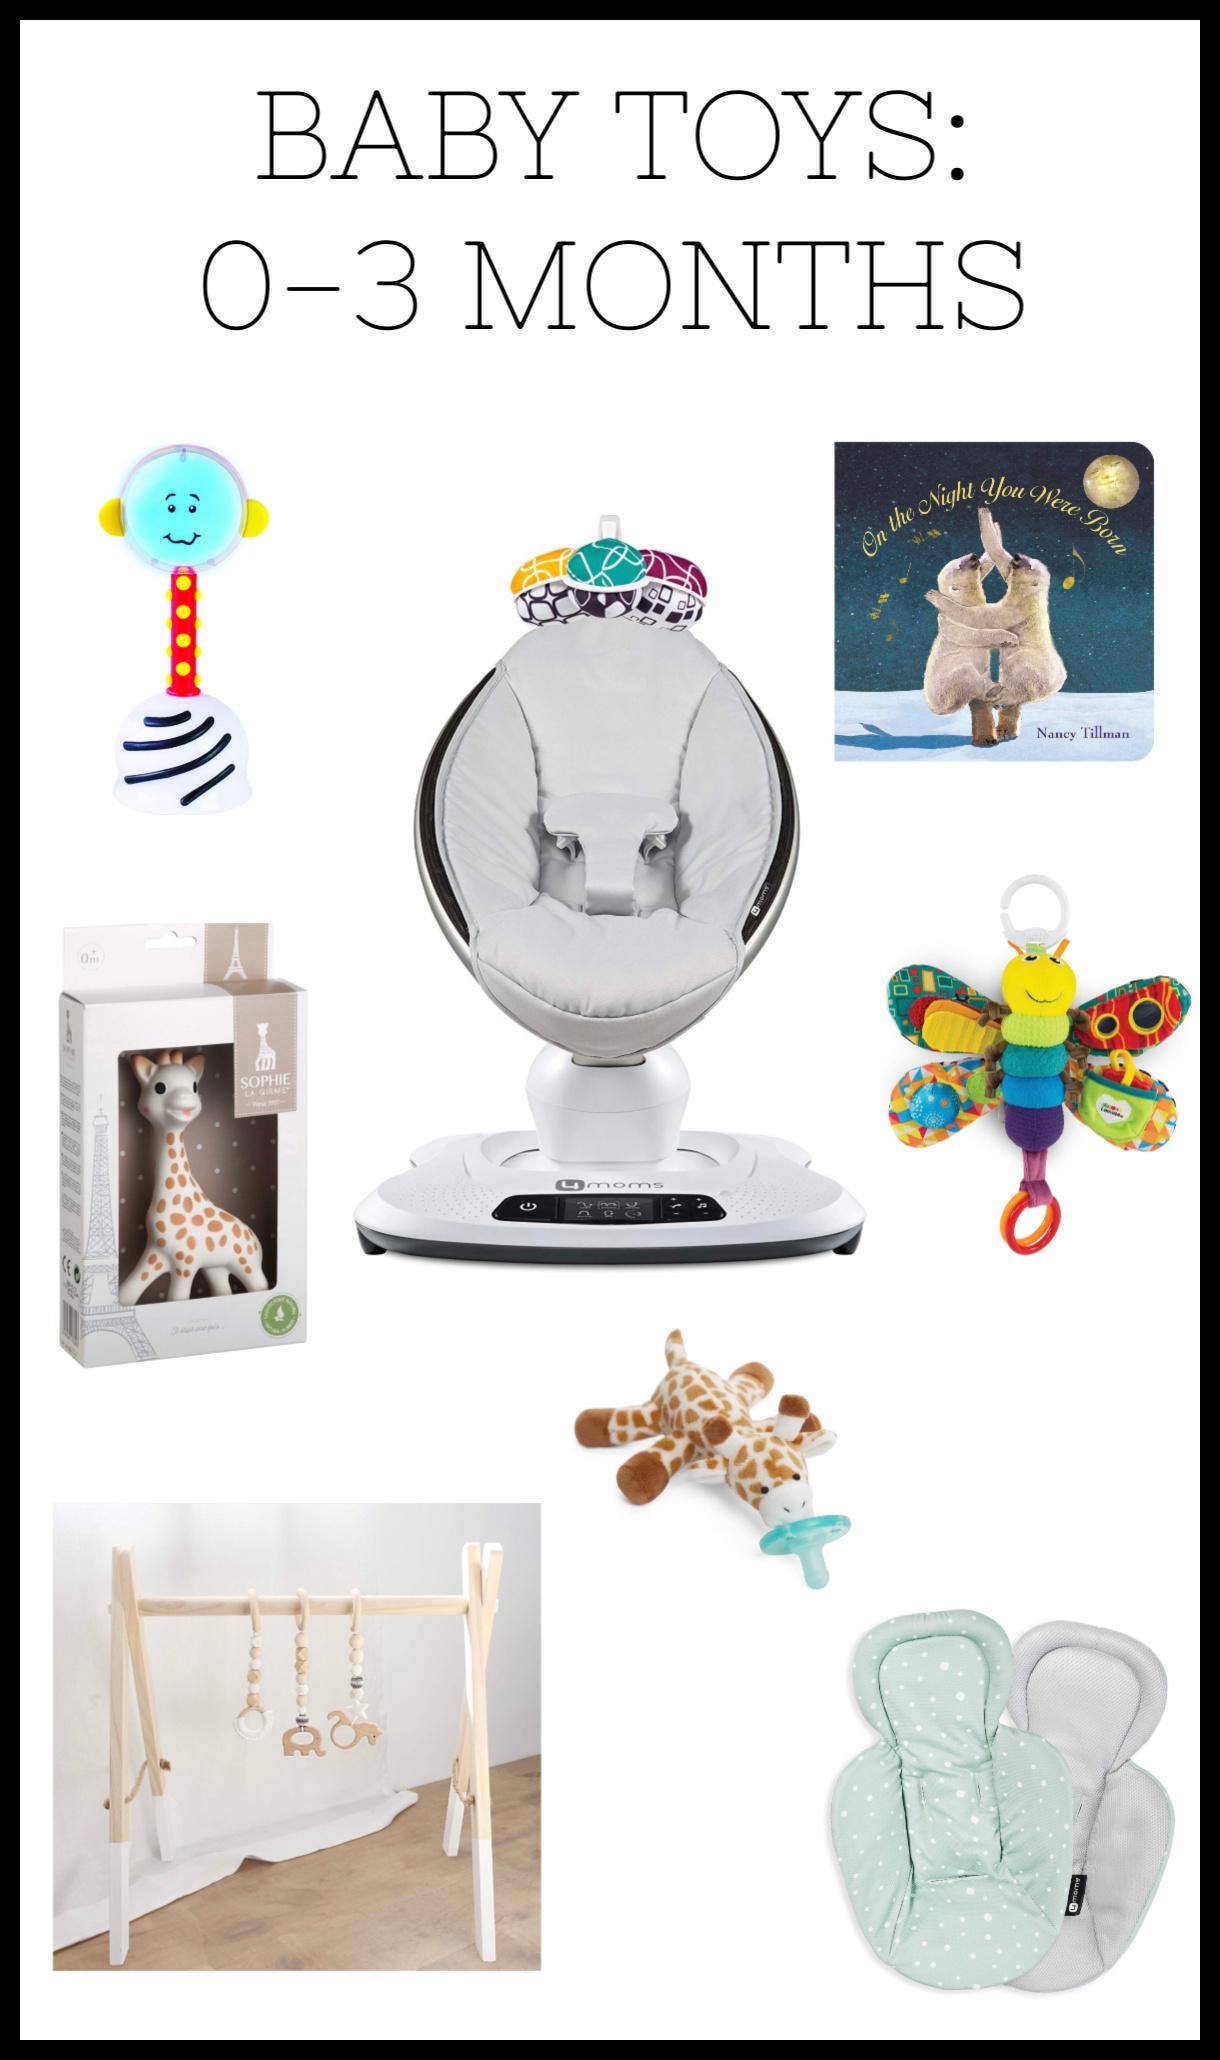 Baby Toys 0-3 Months.jpg